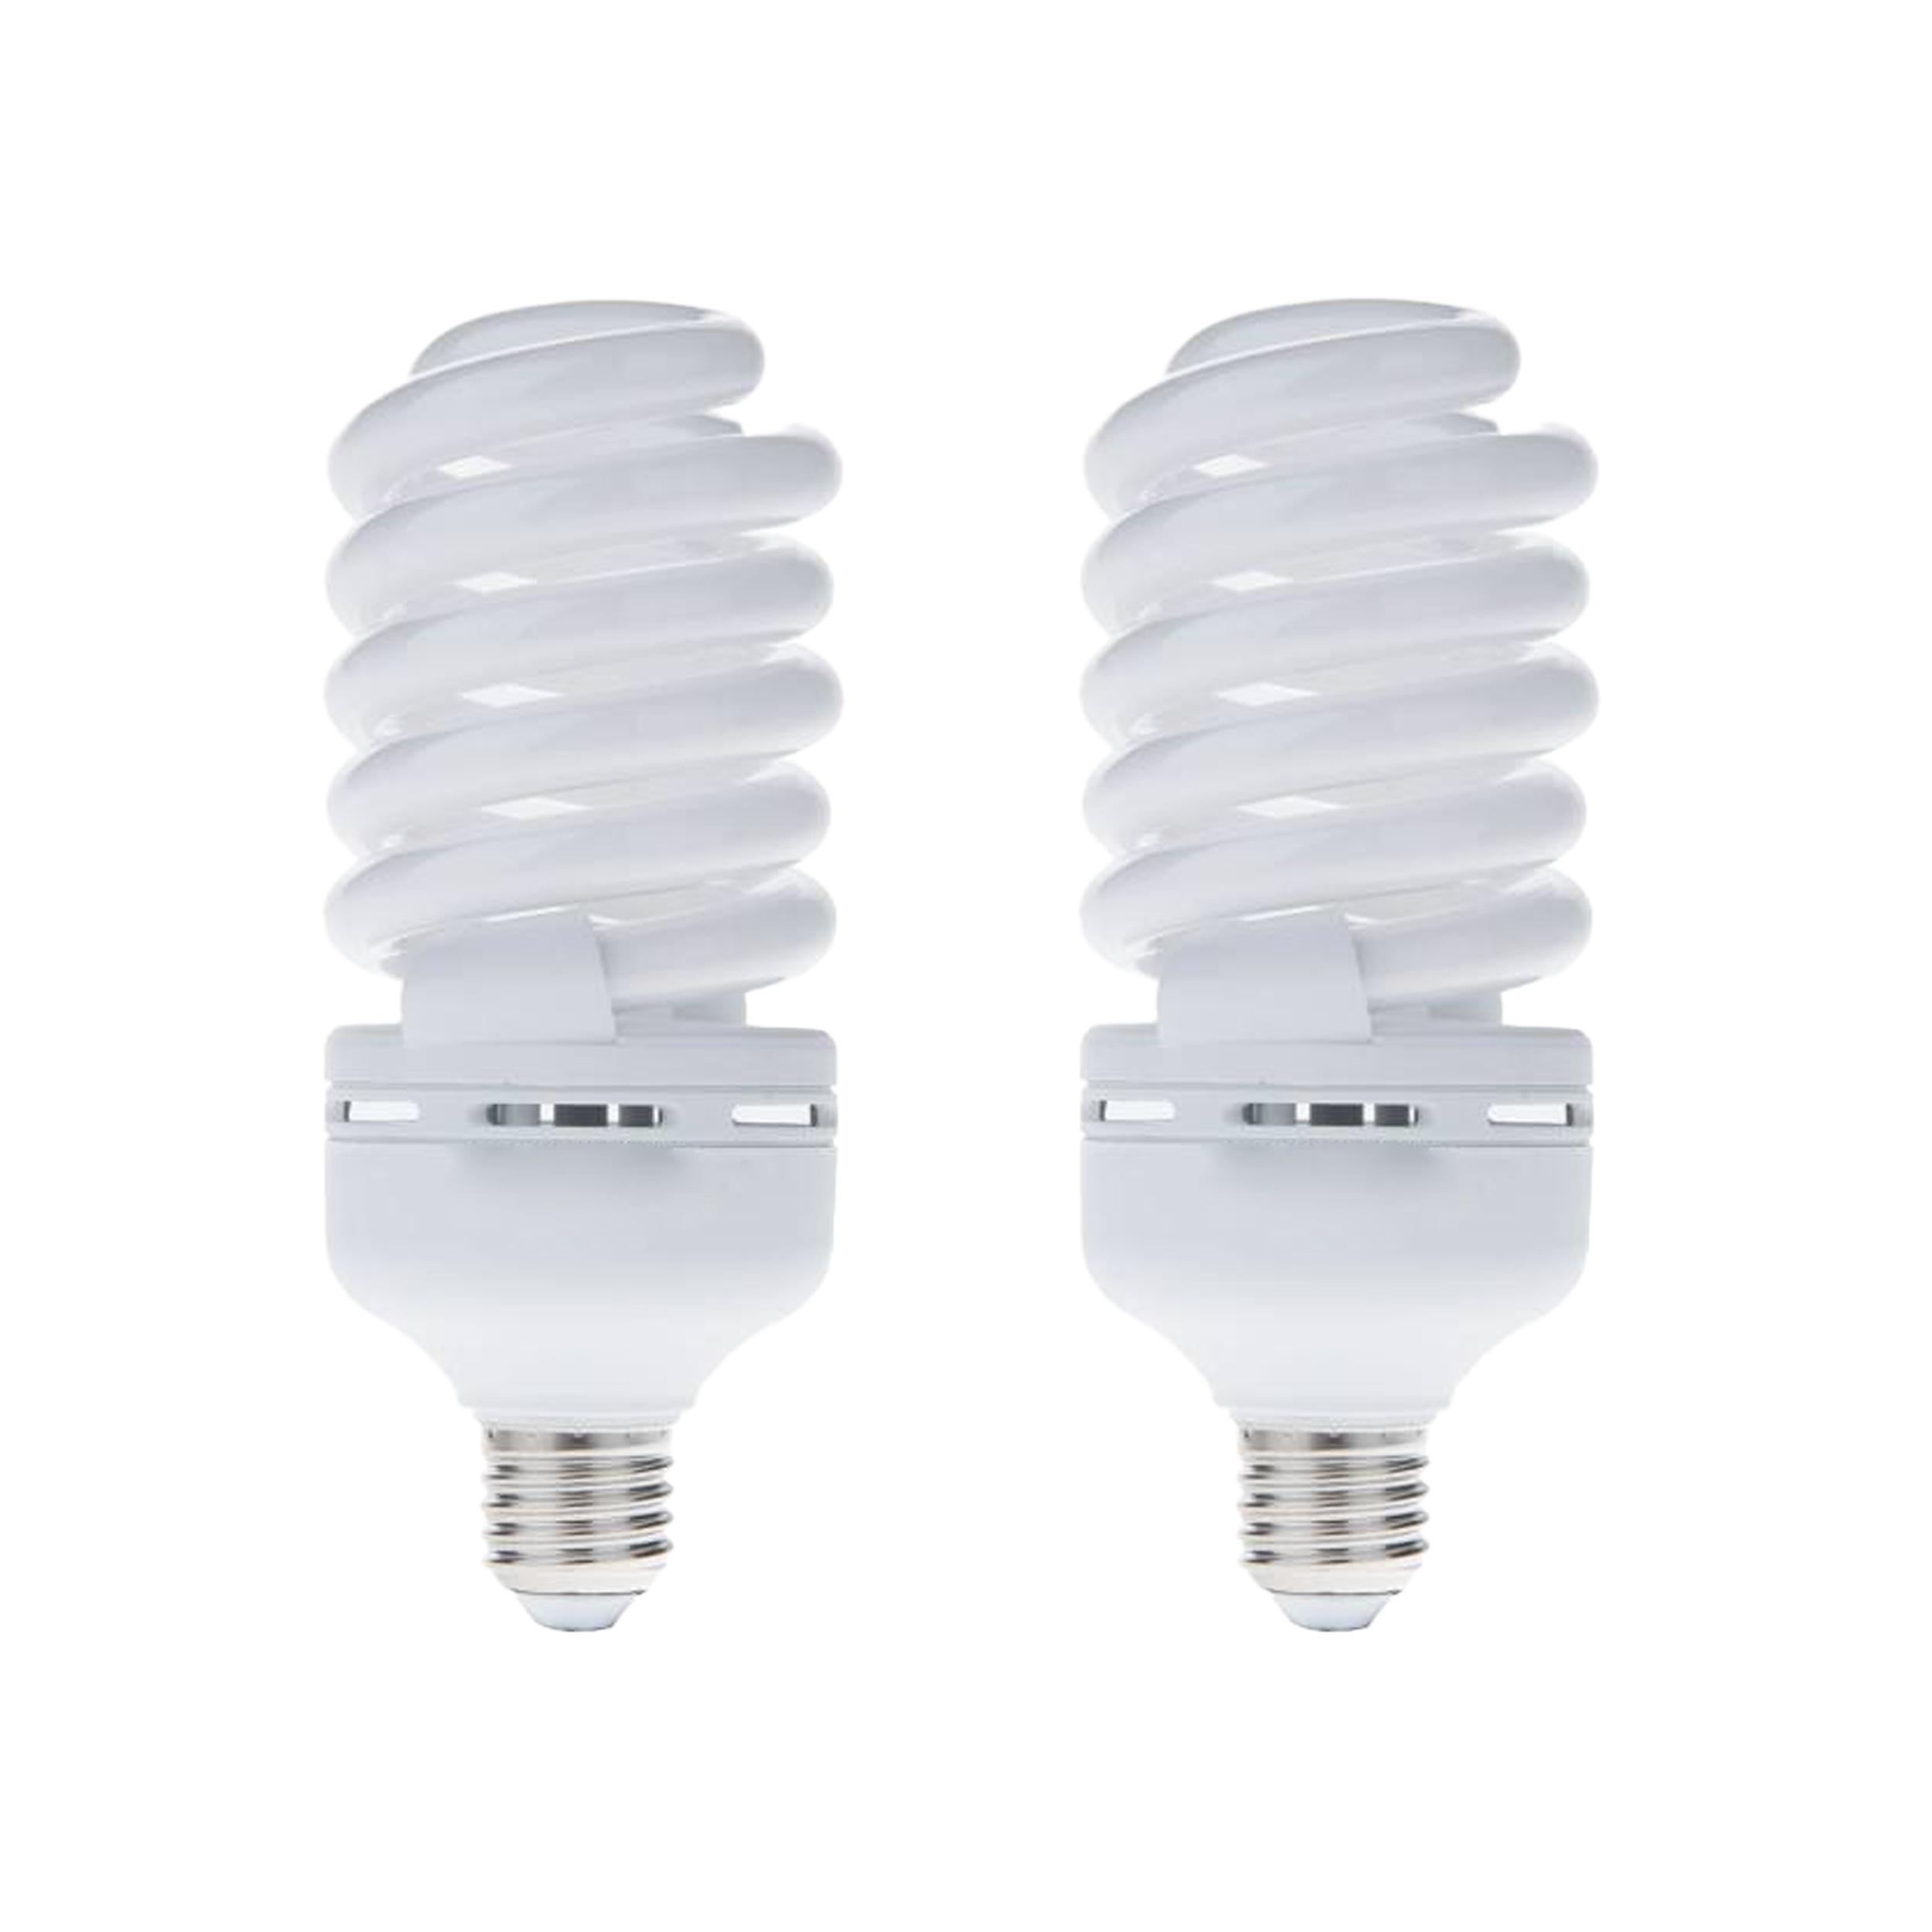 لامپ کم مصرف 40 وات لامپ نور مدل BL پایه E27 بسته 2 عددی